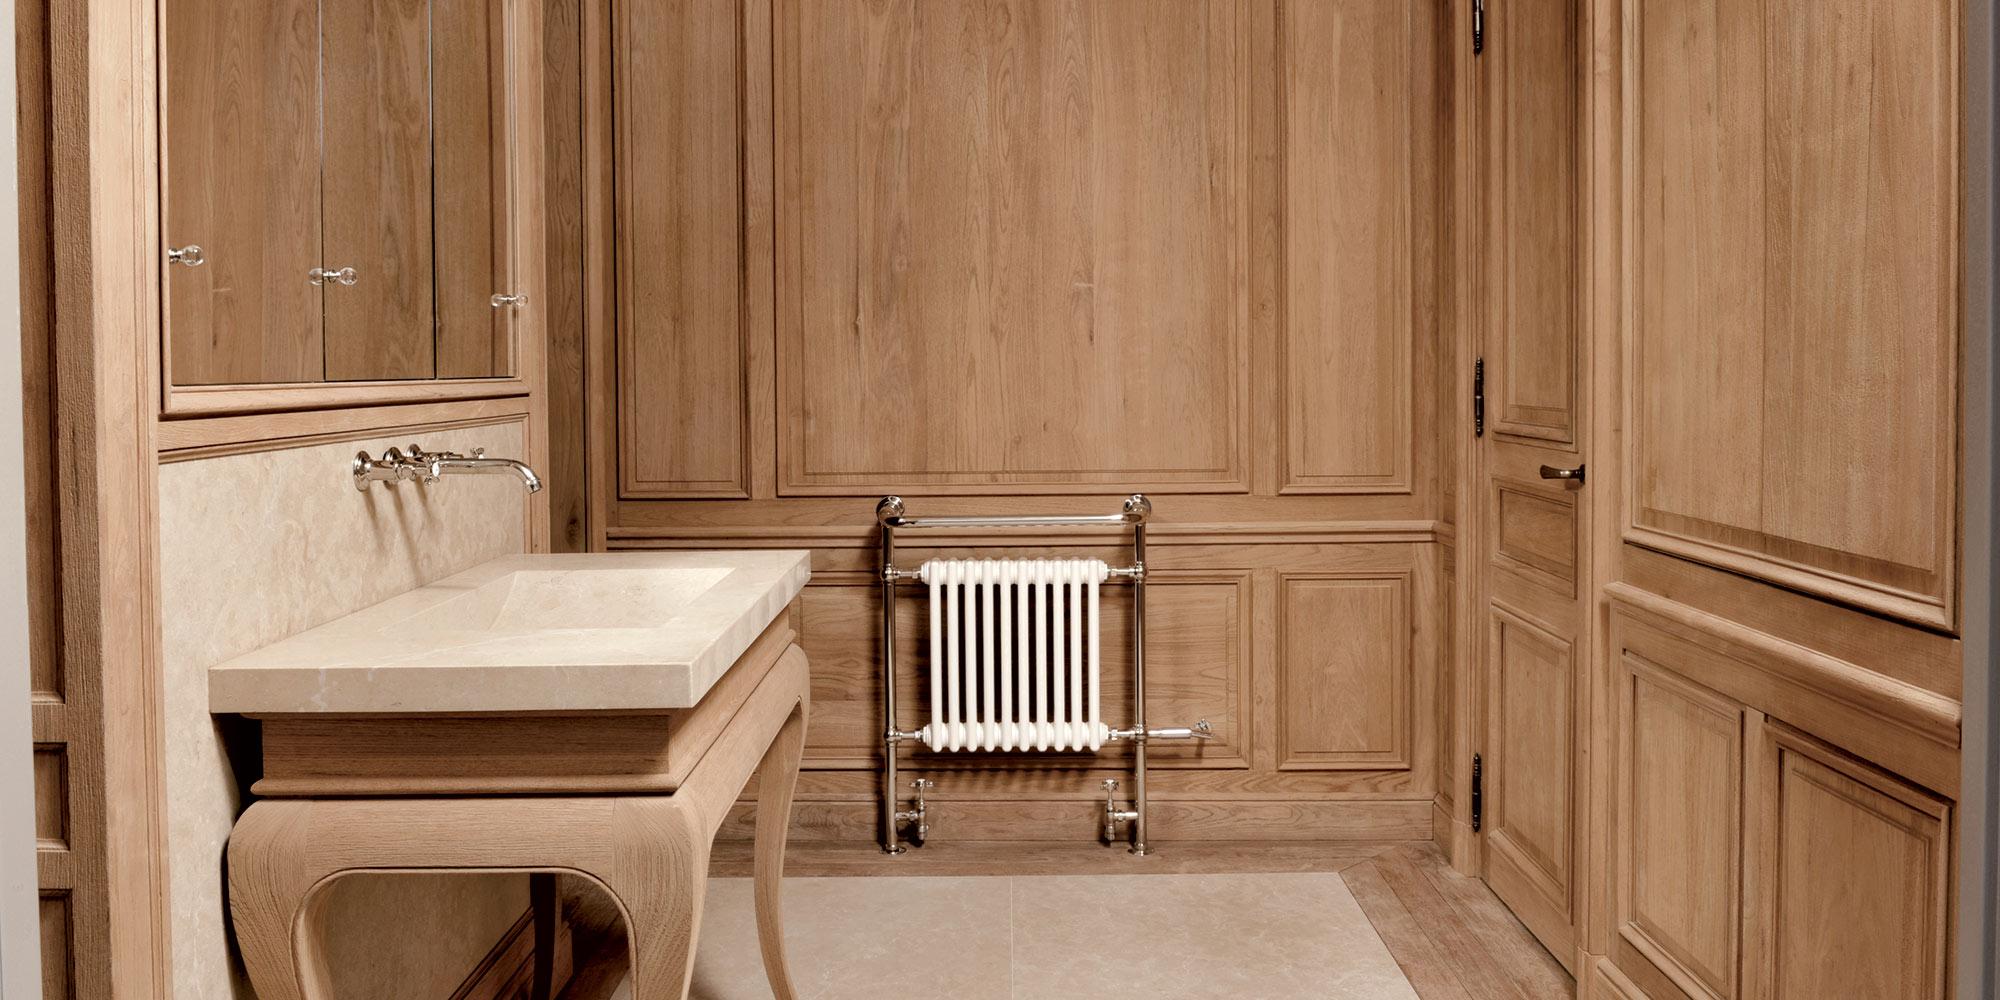 menuiserie sicard. Black Bedroom Furniture Sets. Home Design Ideas